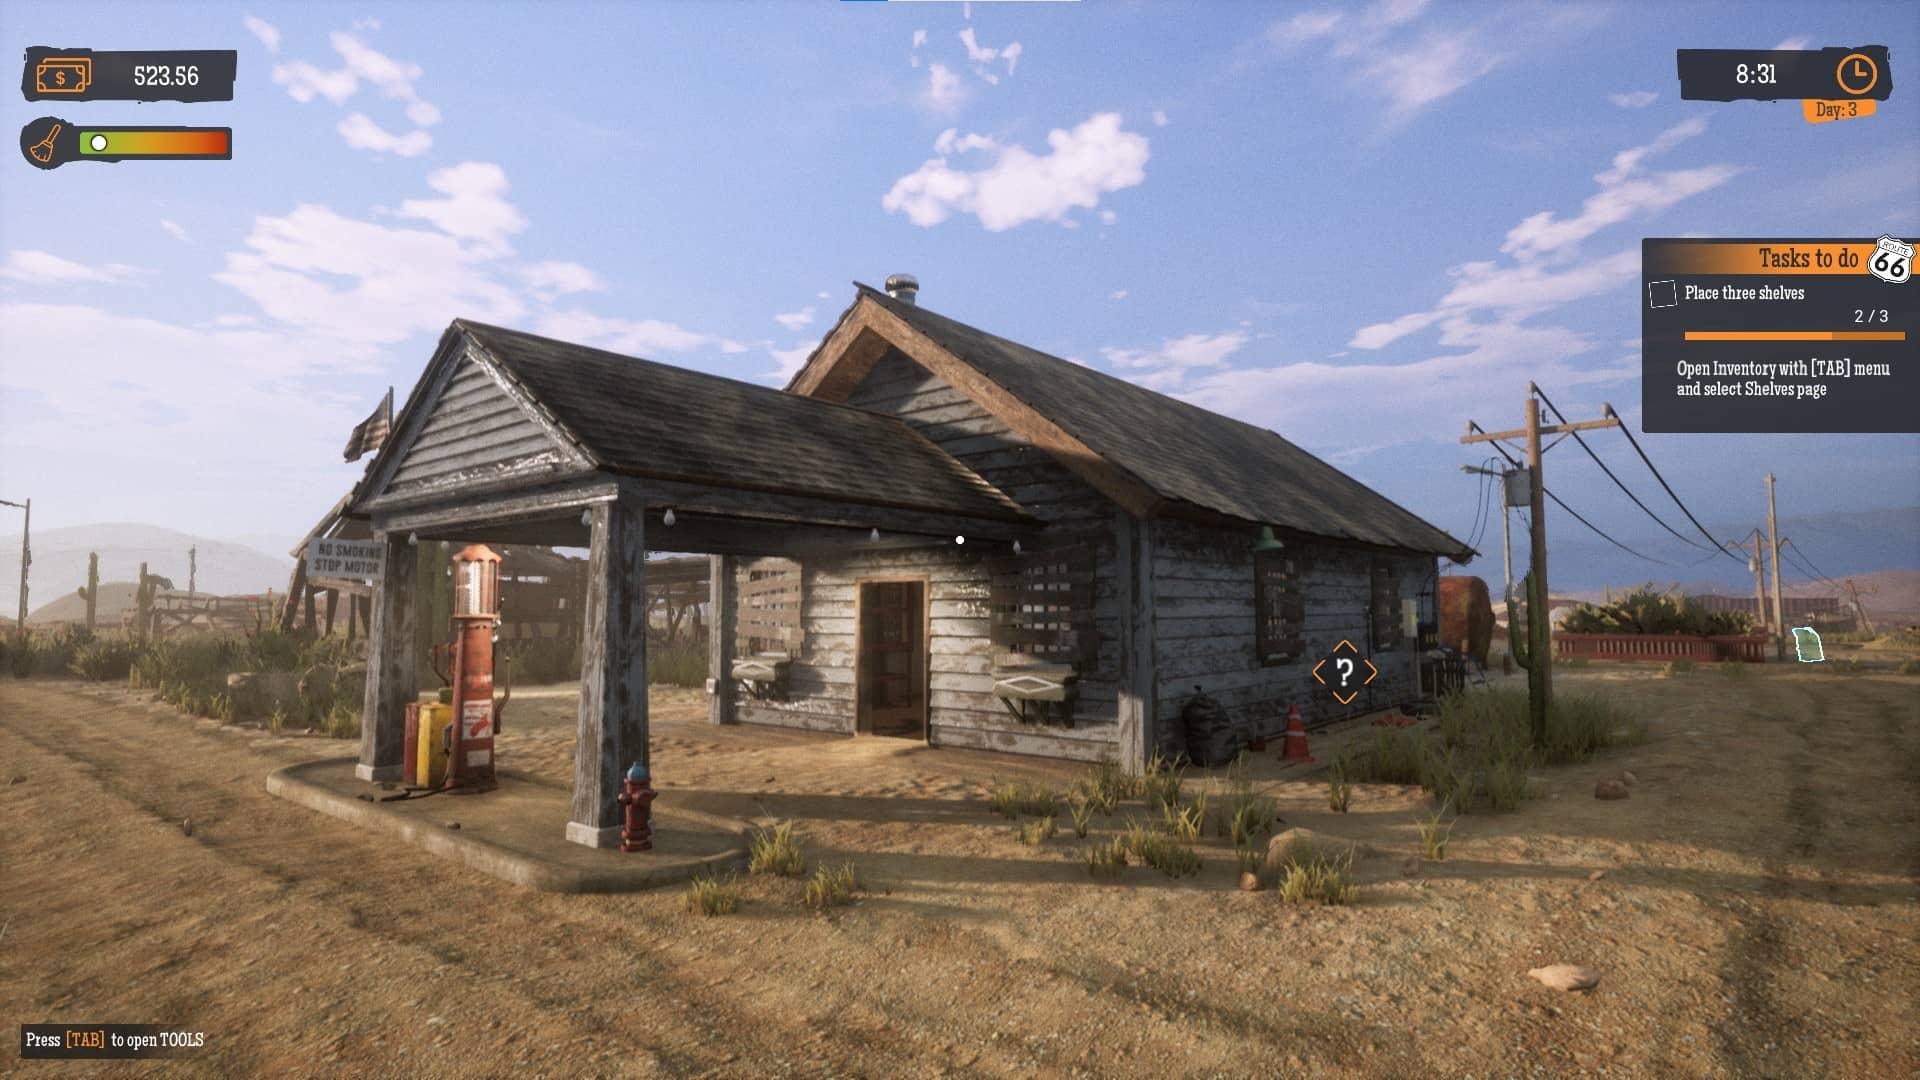 Gas Station Simulator Early Days